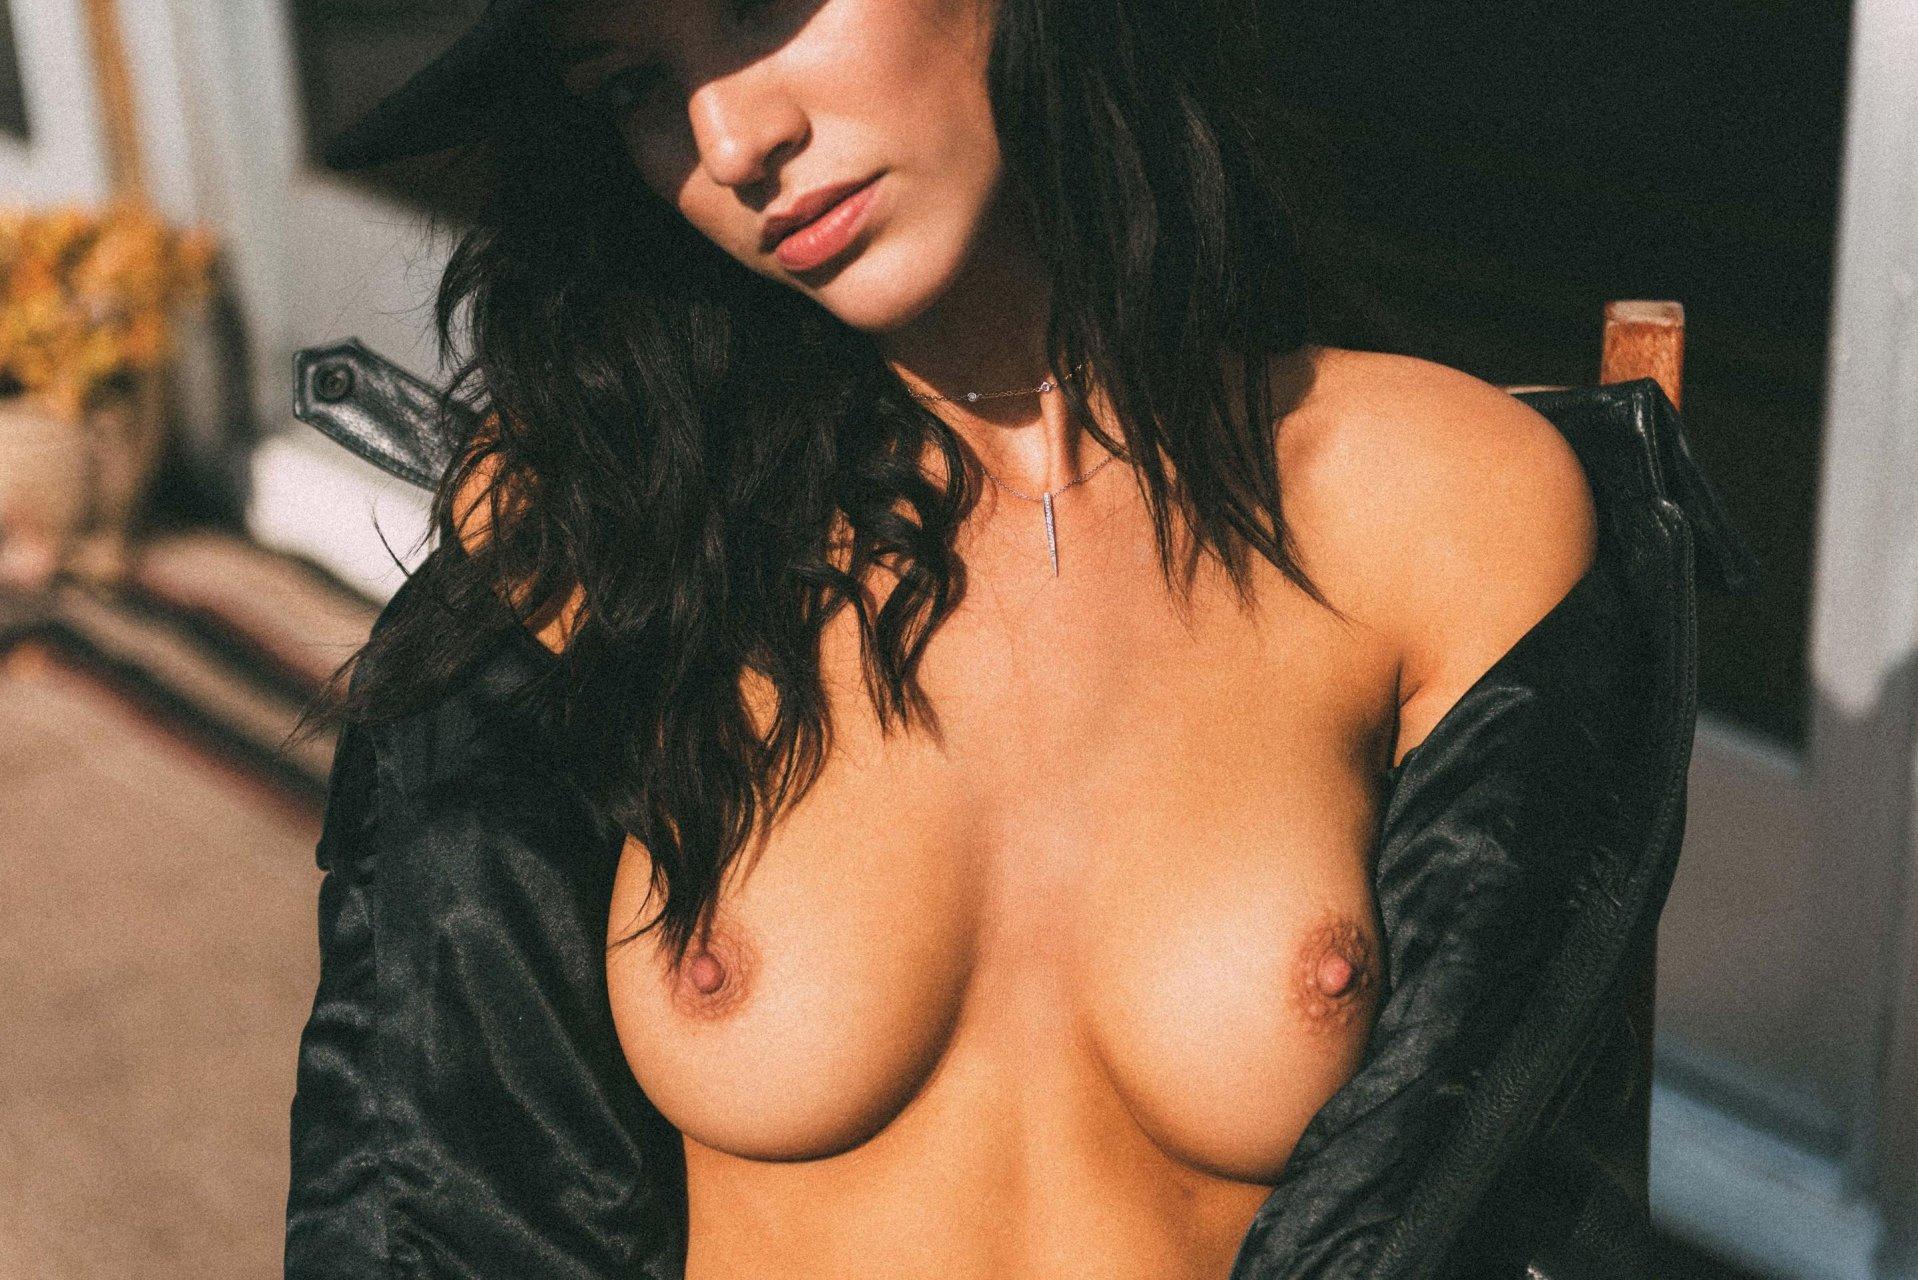 Lesbian mandee smith nude skinny girls fully